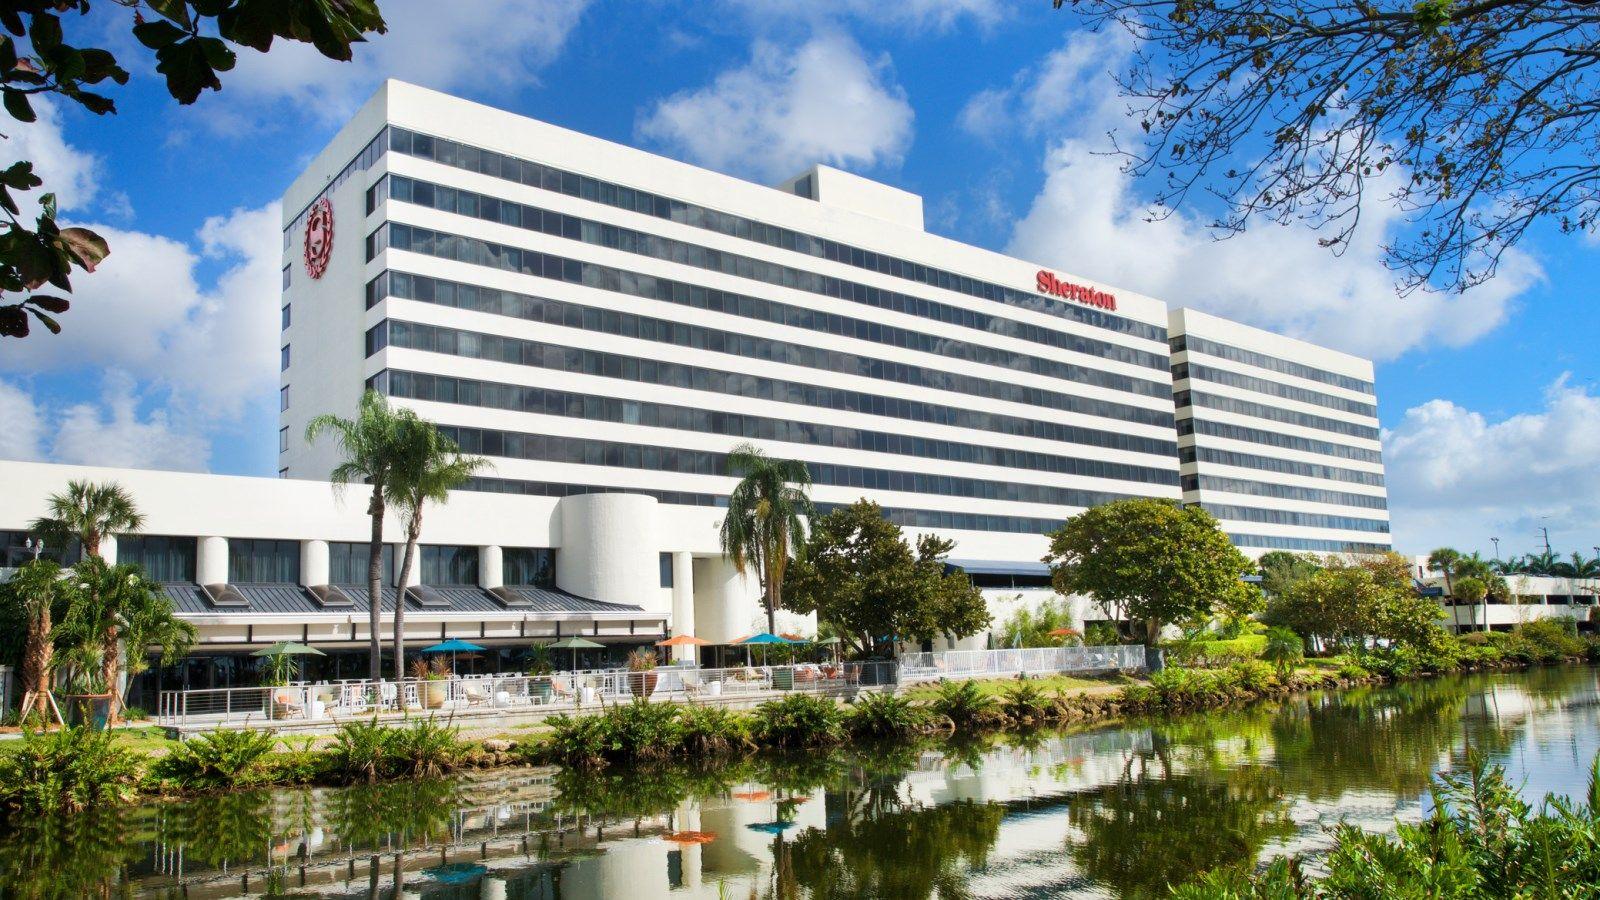 Sheraton Miami Airport Hotel & Executive Meeting Center image 1